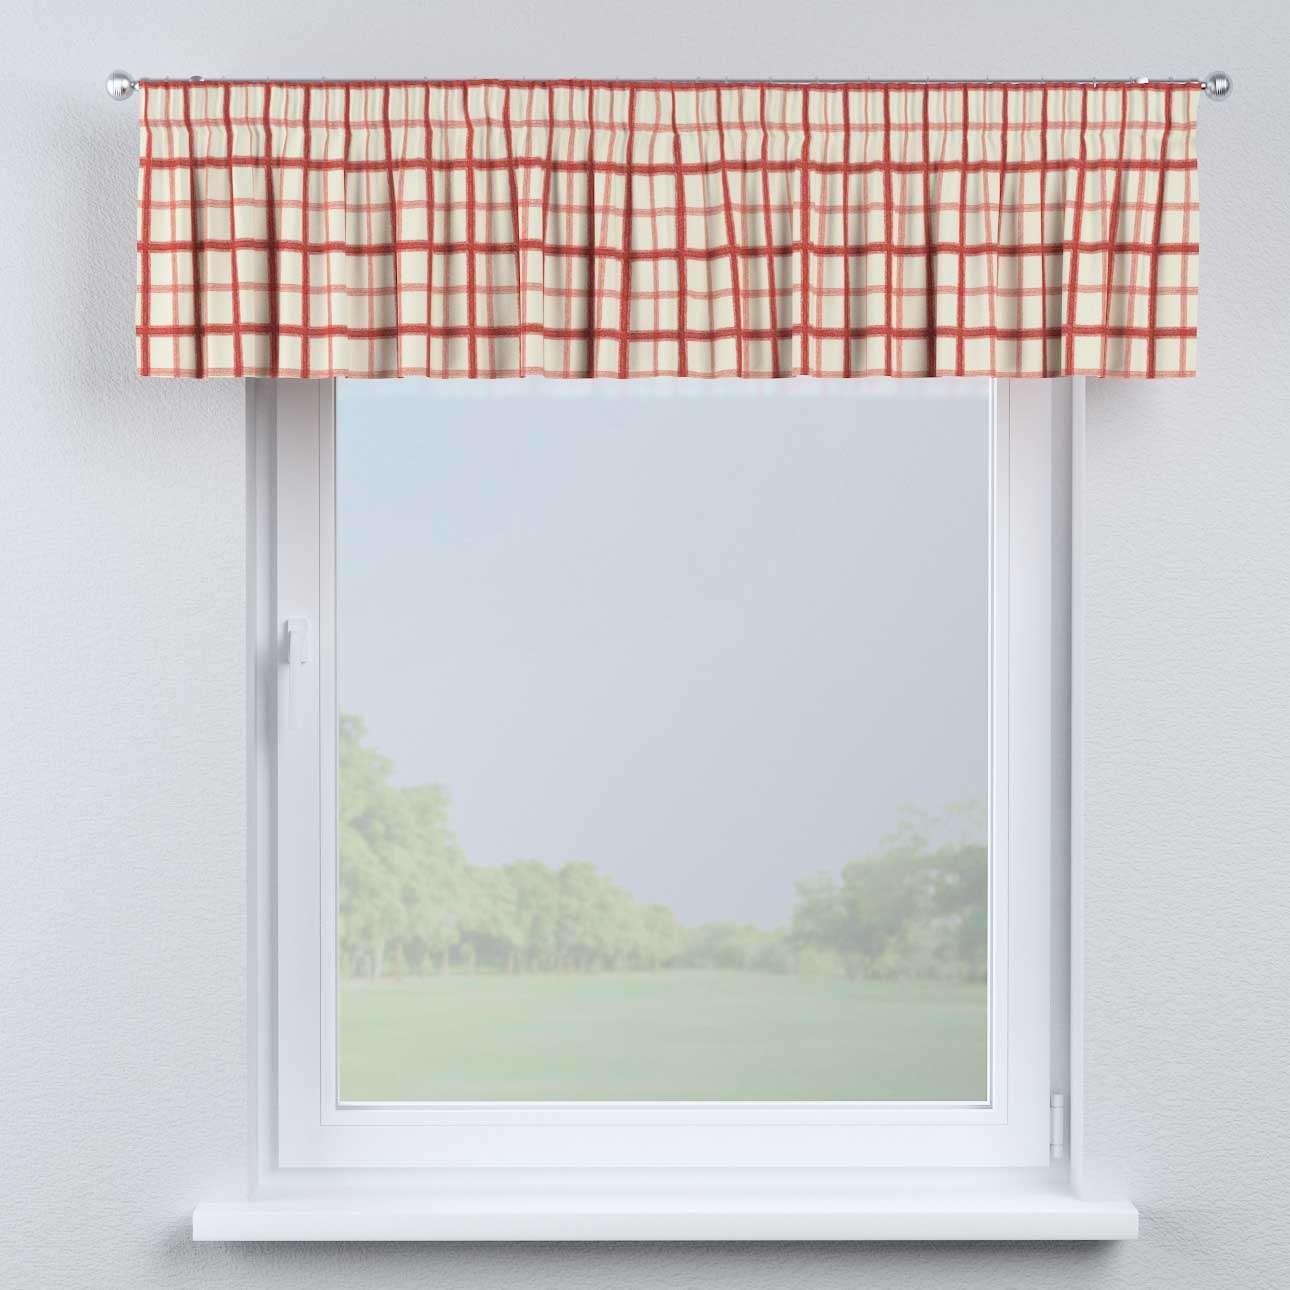 Gardinkappa med rynkband 130 x 40 cm i kollektionen Avinon, Tyg: 131-15